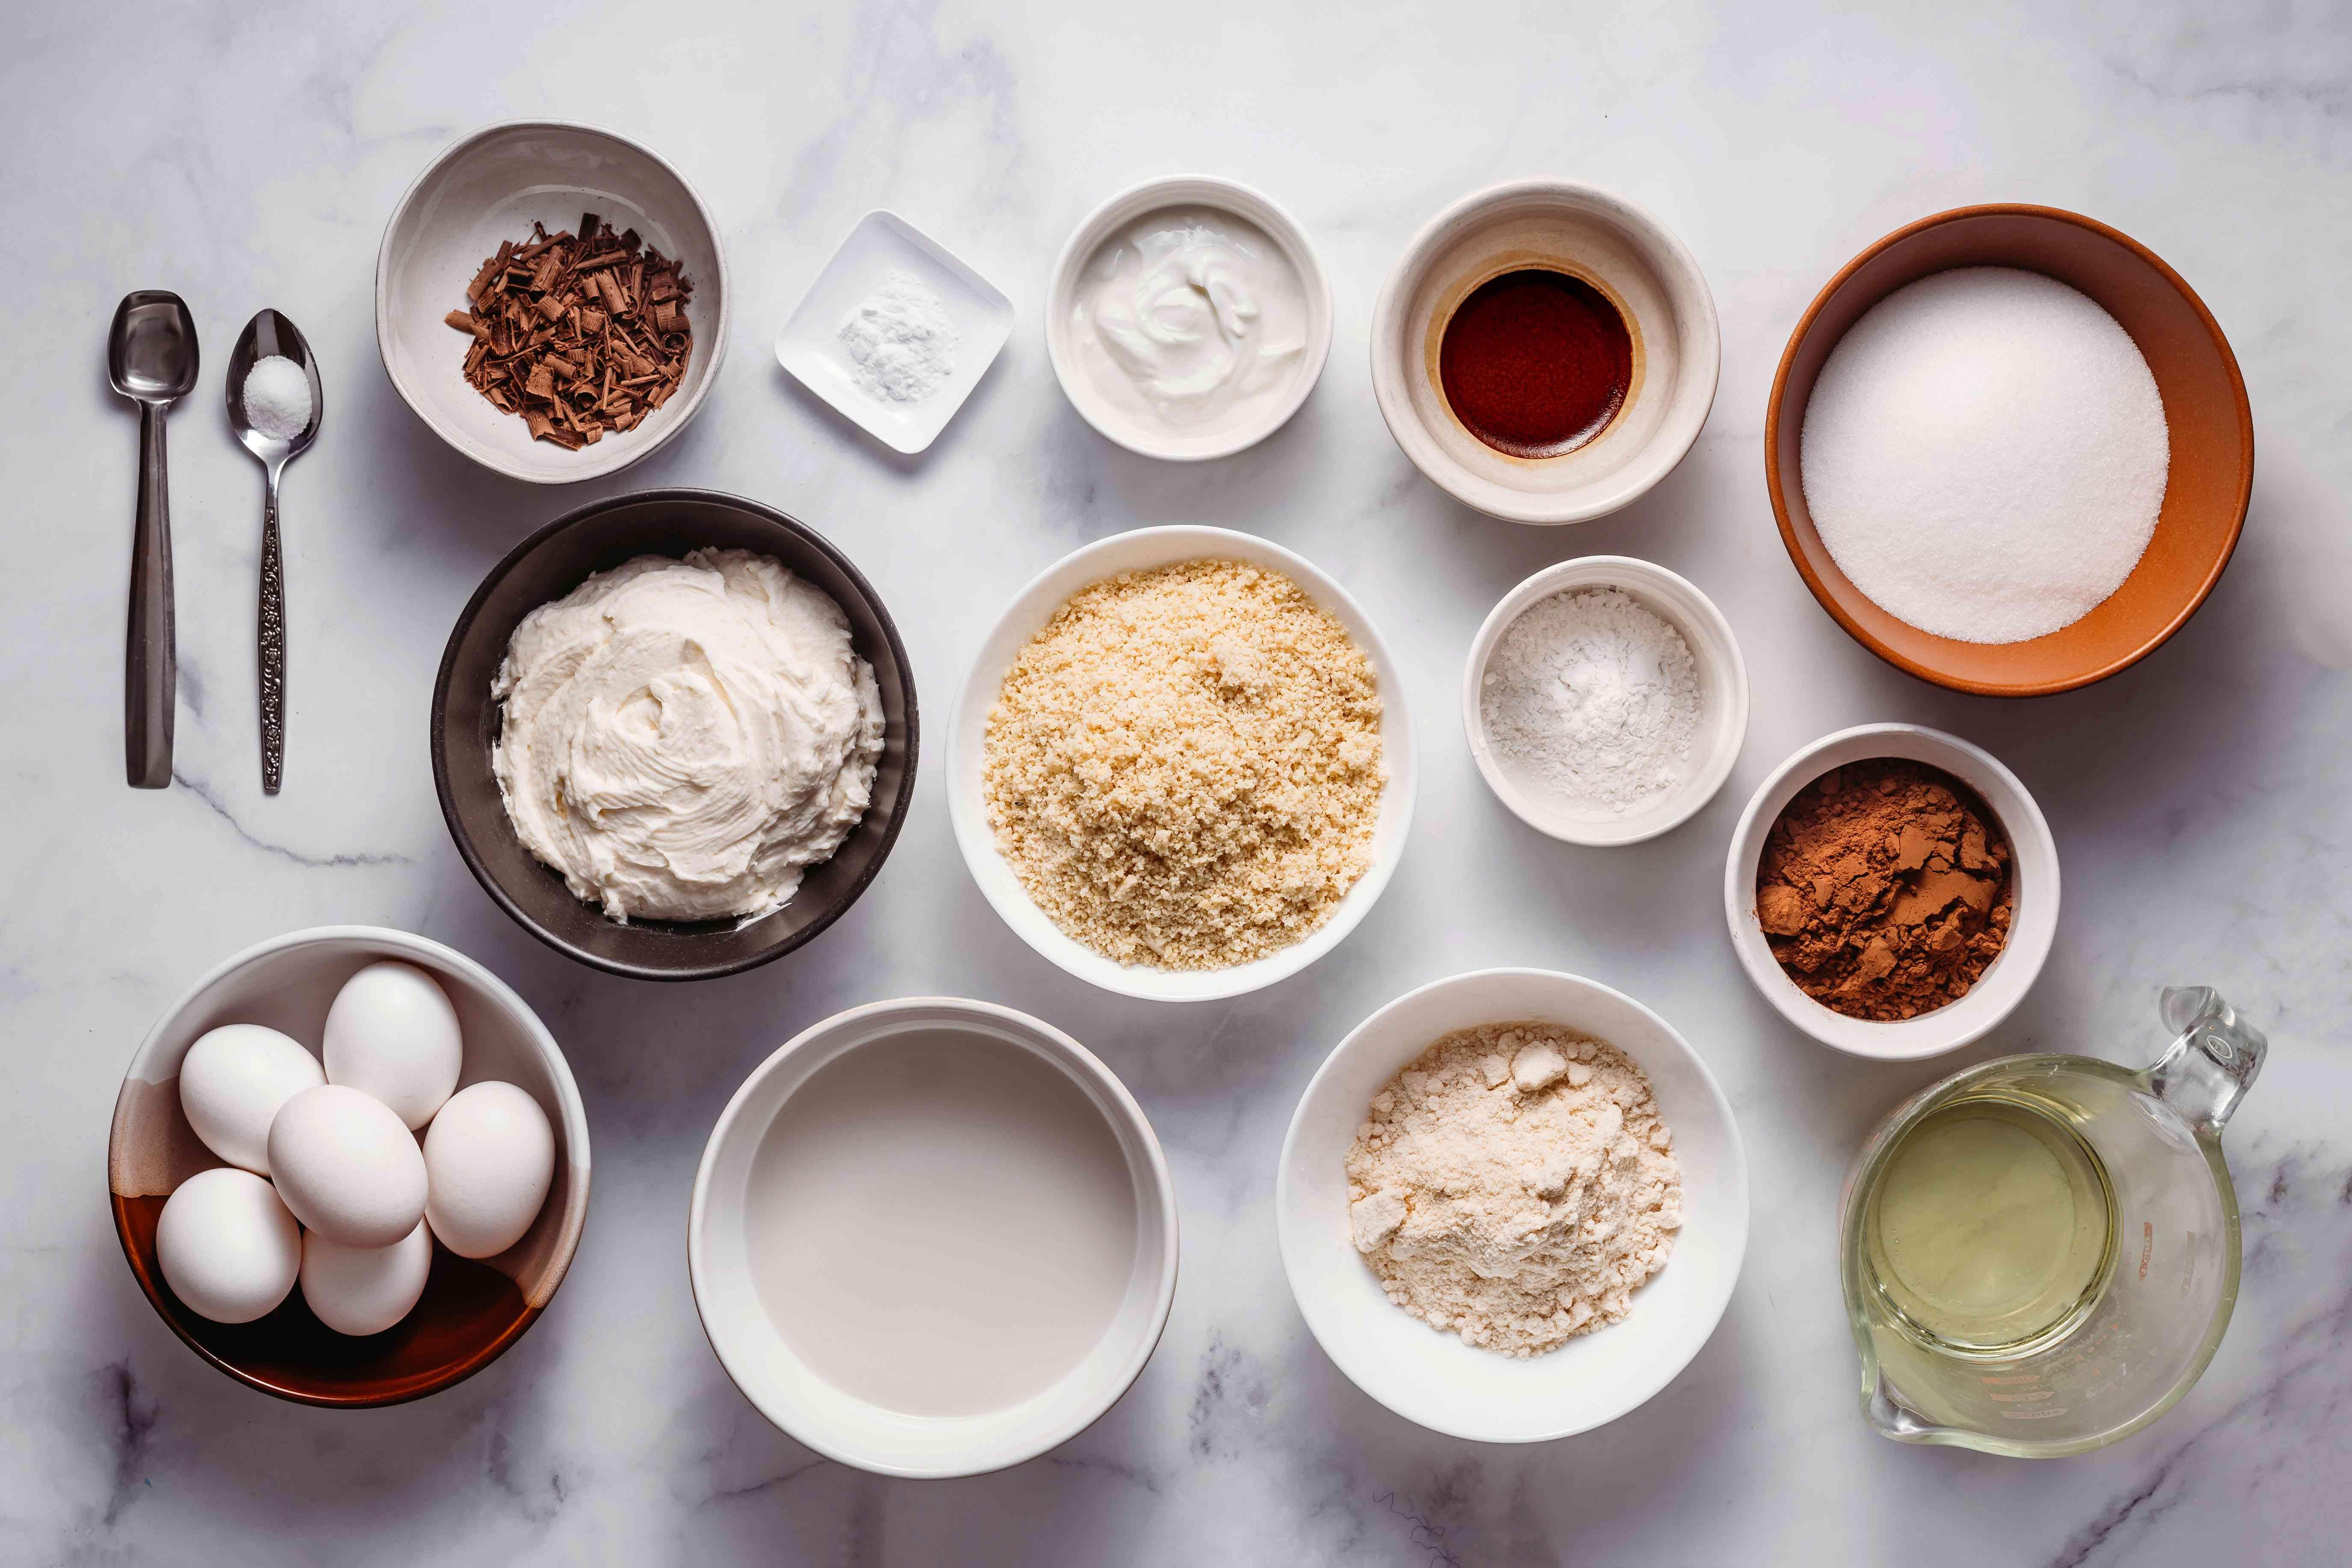 Chocolate Keto Birthday Cake ingredients